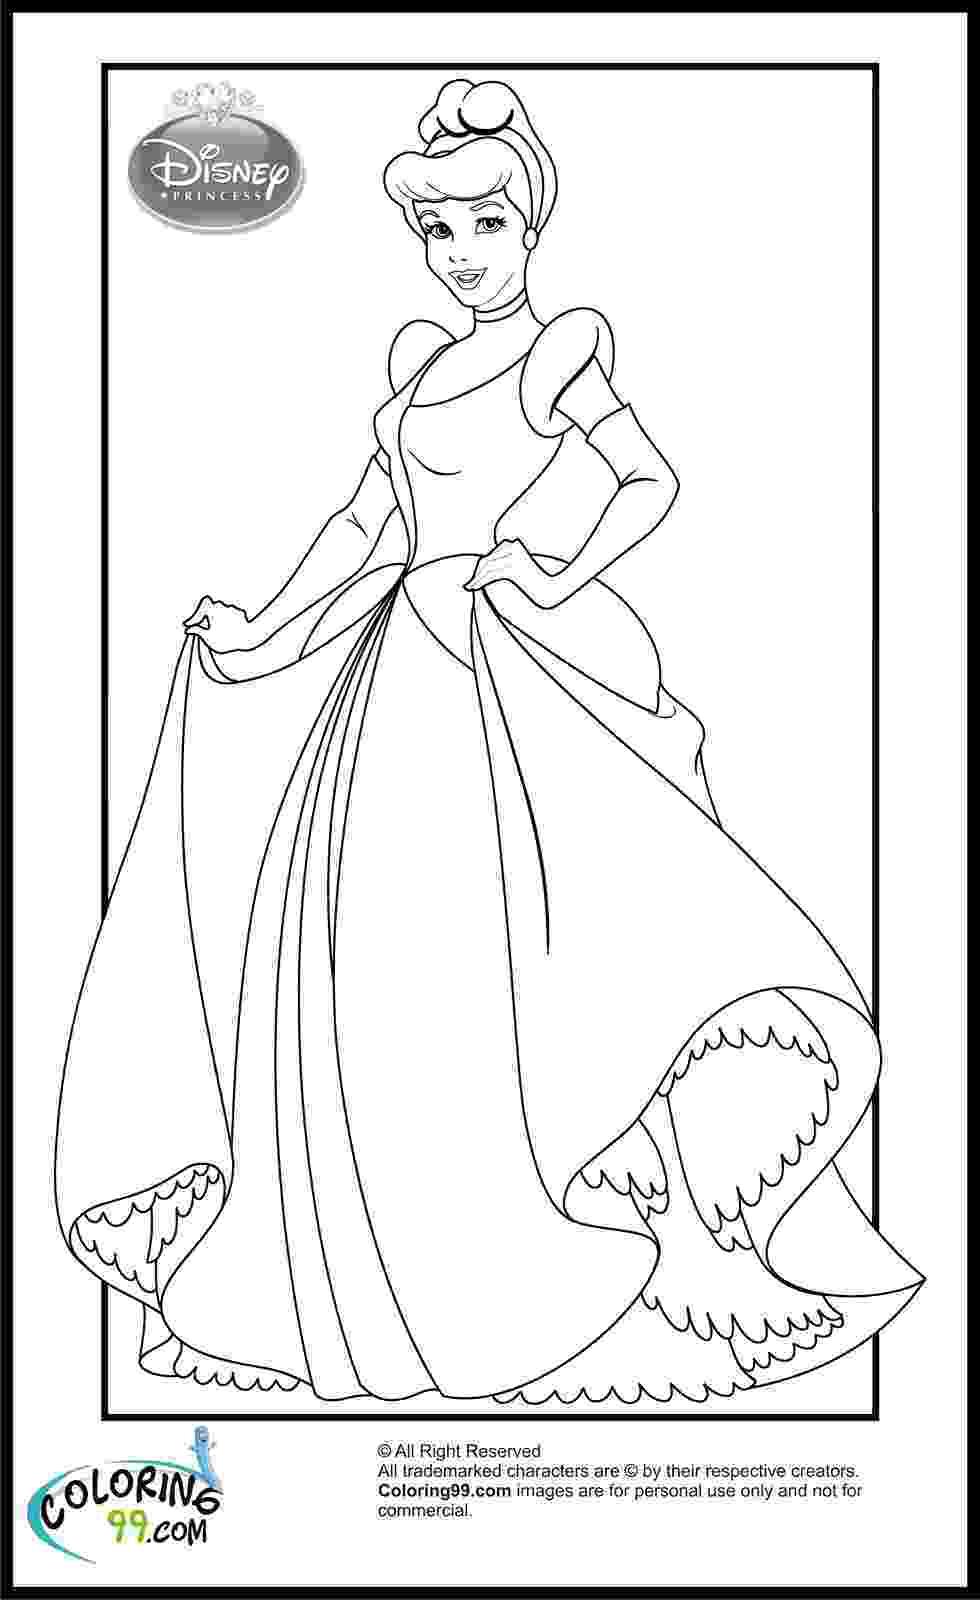 disnep princess coloring pages printable free printable disney princess ariel mermaid printable disnep princess pages coloring